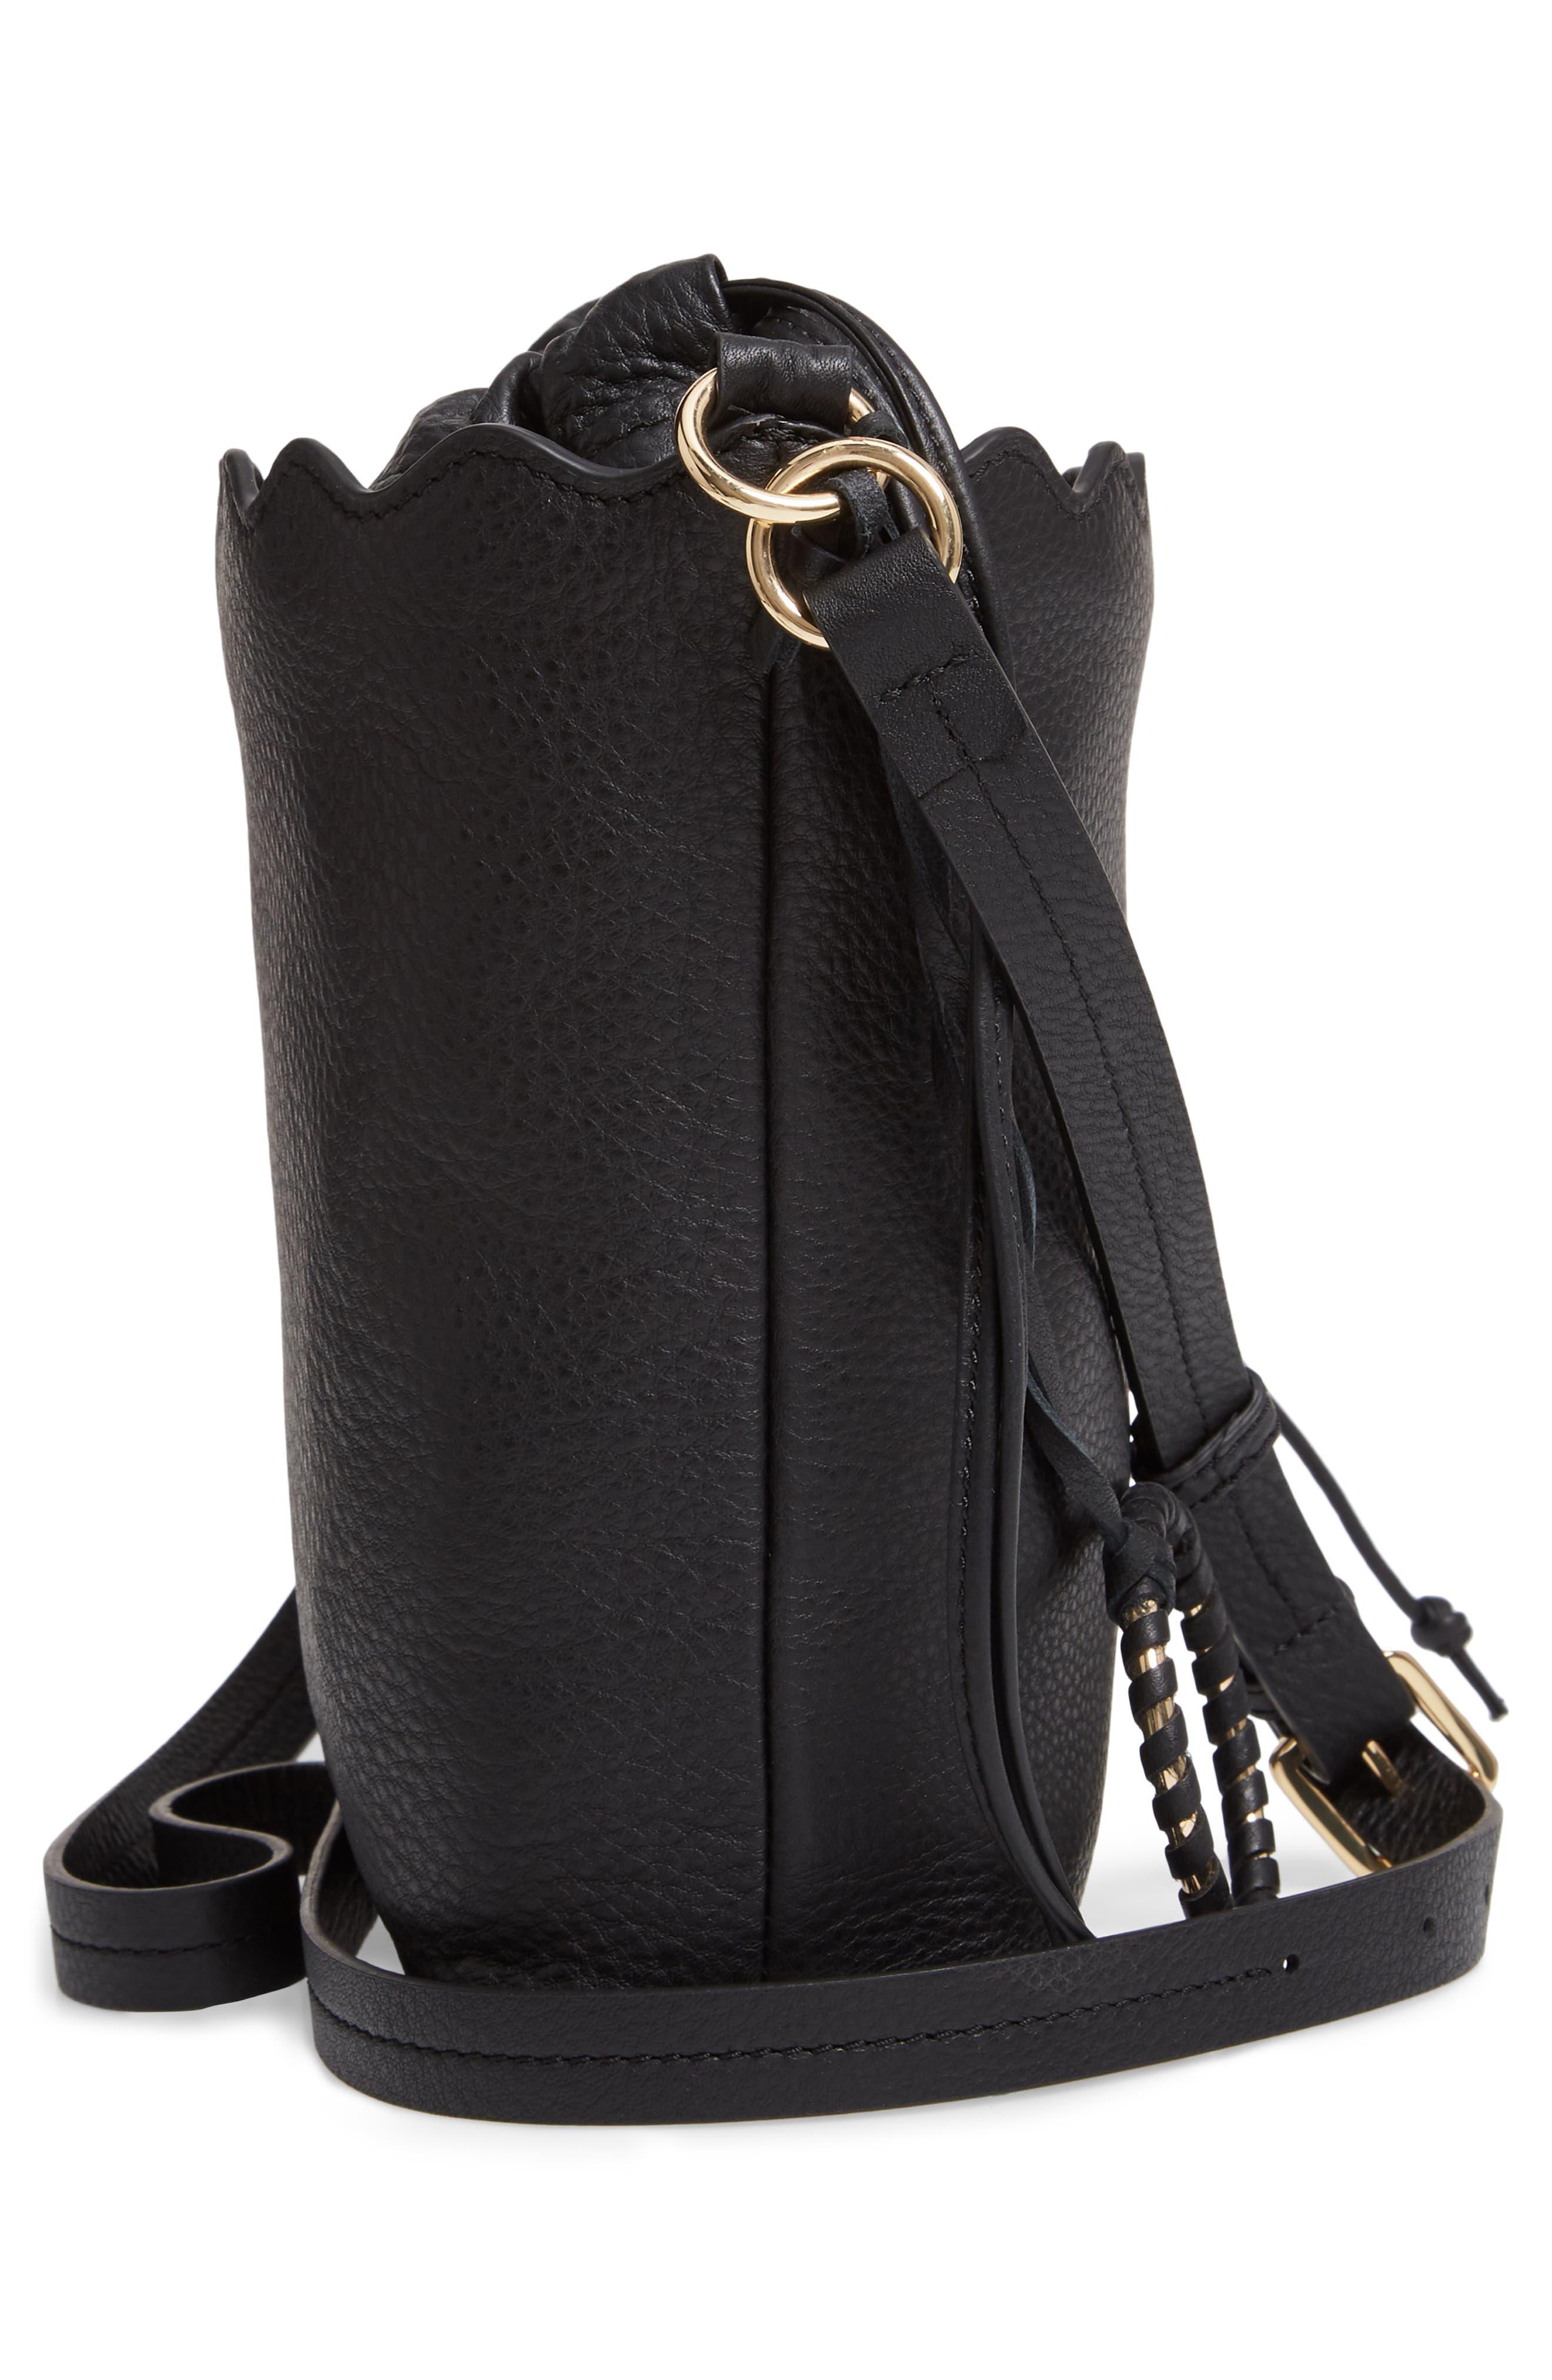 VINCE CAMUTO, Wavy Leather Bucket Bag, Alternate thumbnail 6, color, BLACK